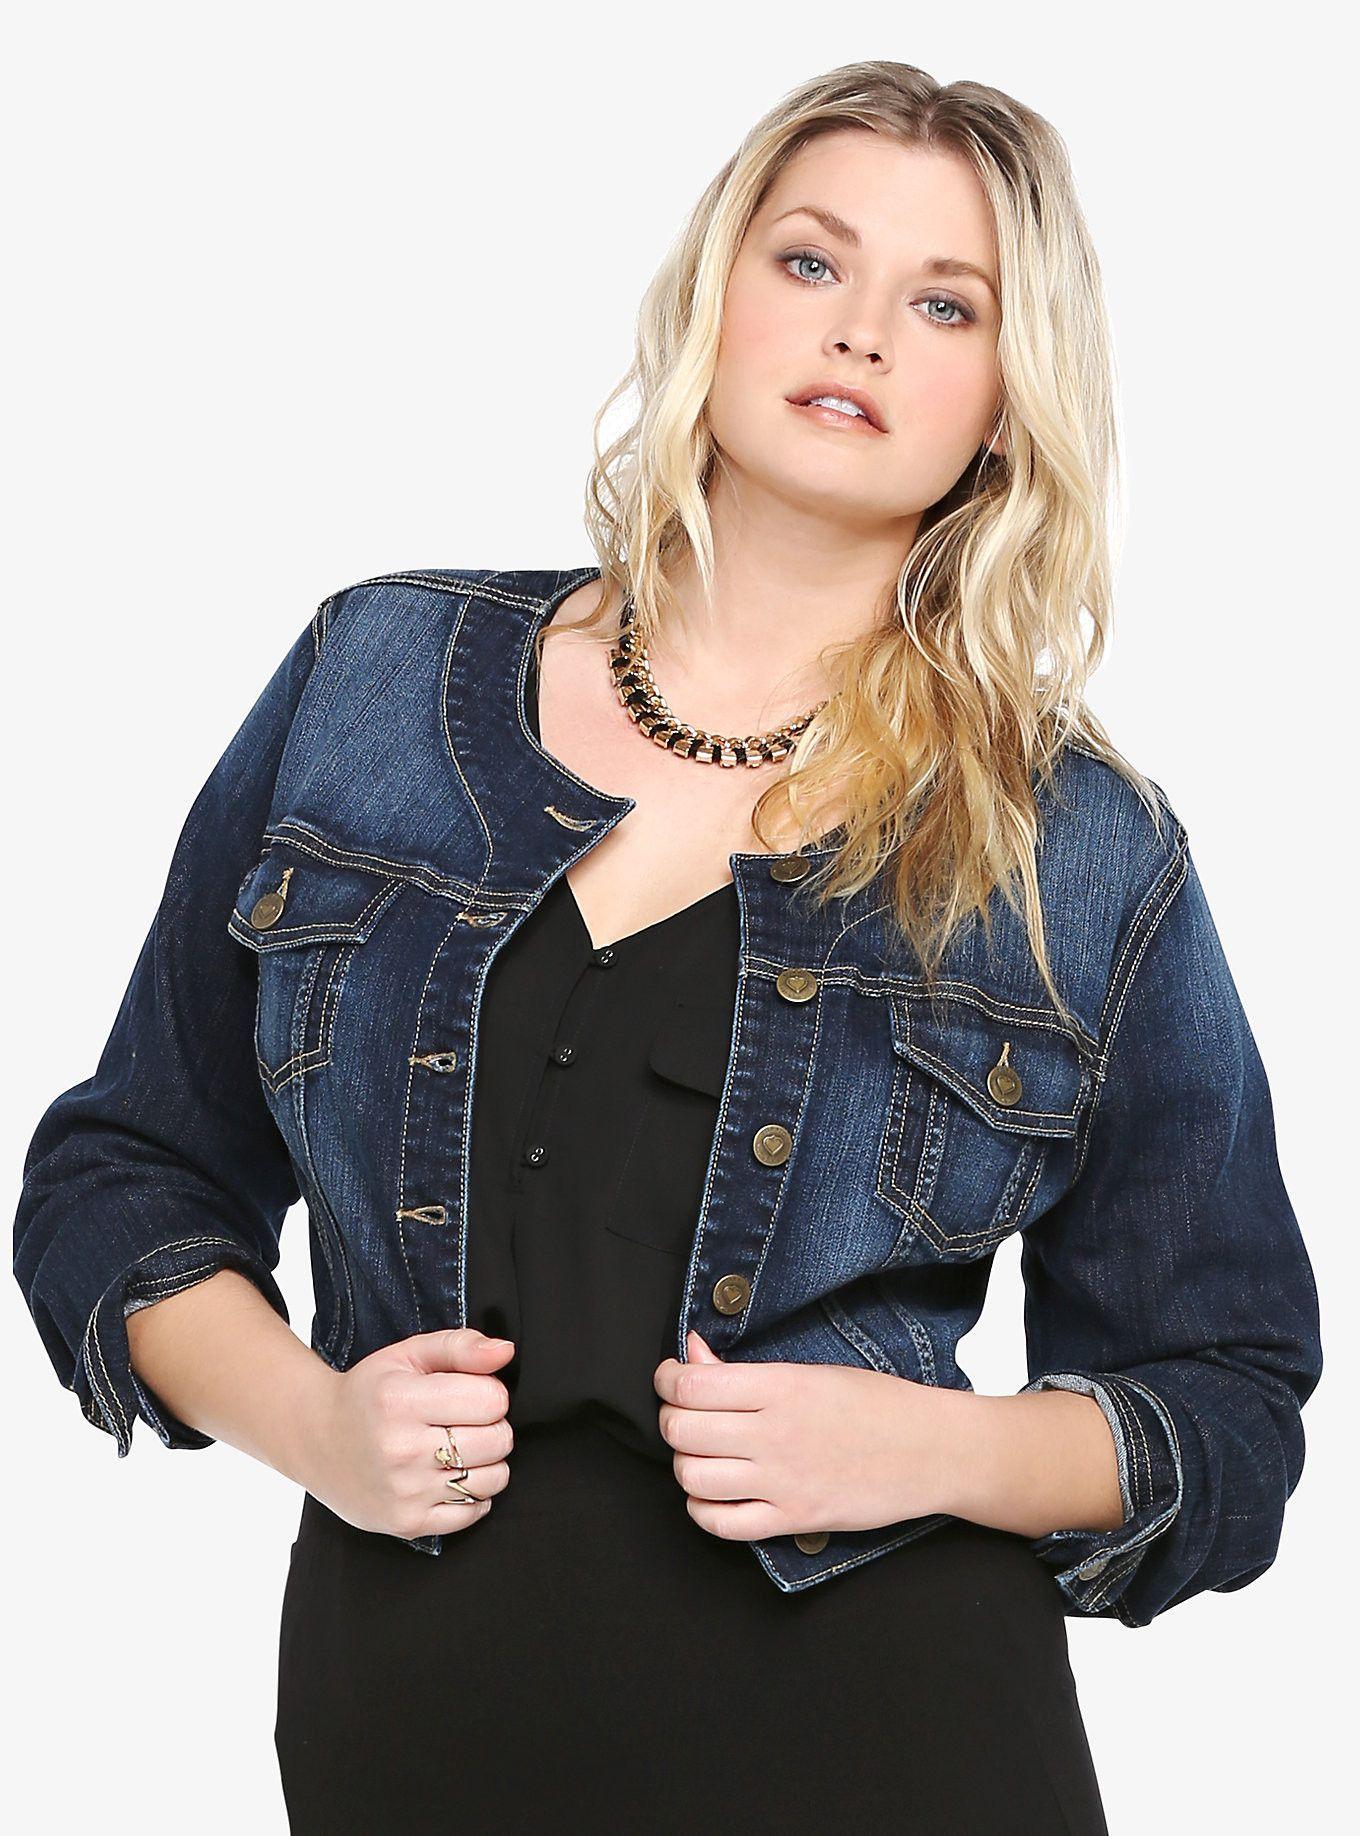 Torrid Cropped Denim Jacket Dark Wash Online Only Curve Appeal Fashion Boutique Collarless Denim Jacket Cropped Denim Jacket Best Jean Jackets [ 1836 x 1360 Pixel ]